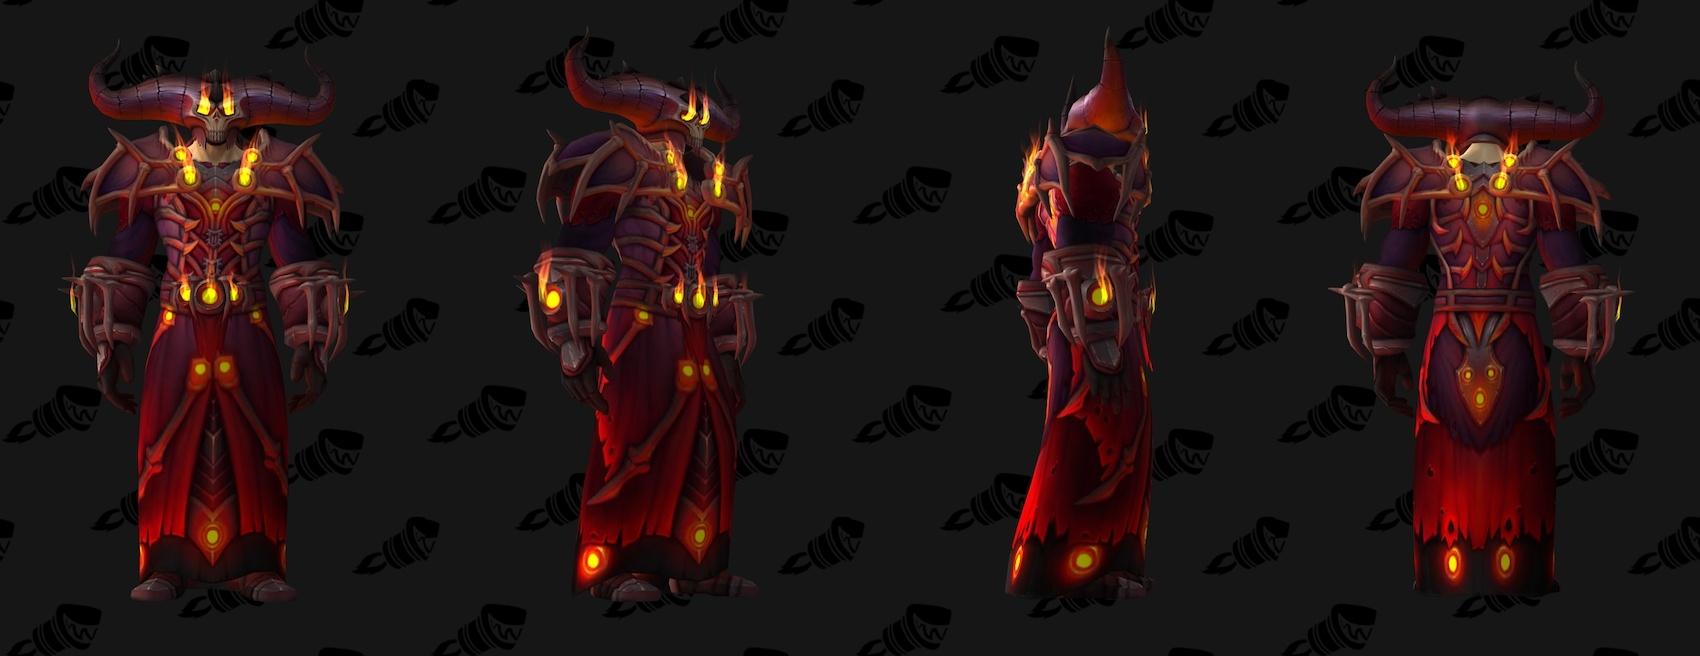 Warlock Tier 20 Armor Set Models - Notizia di Wowhead